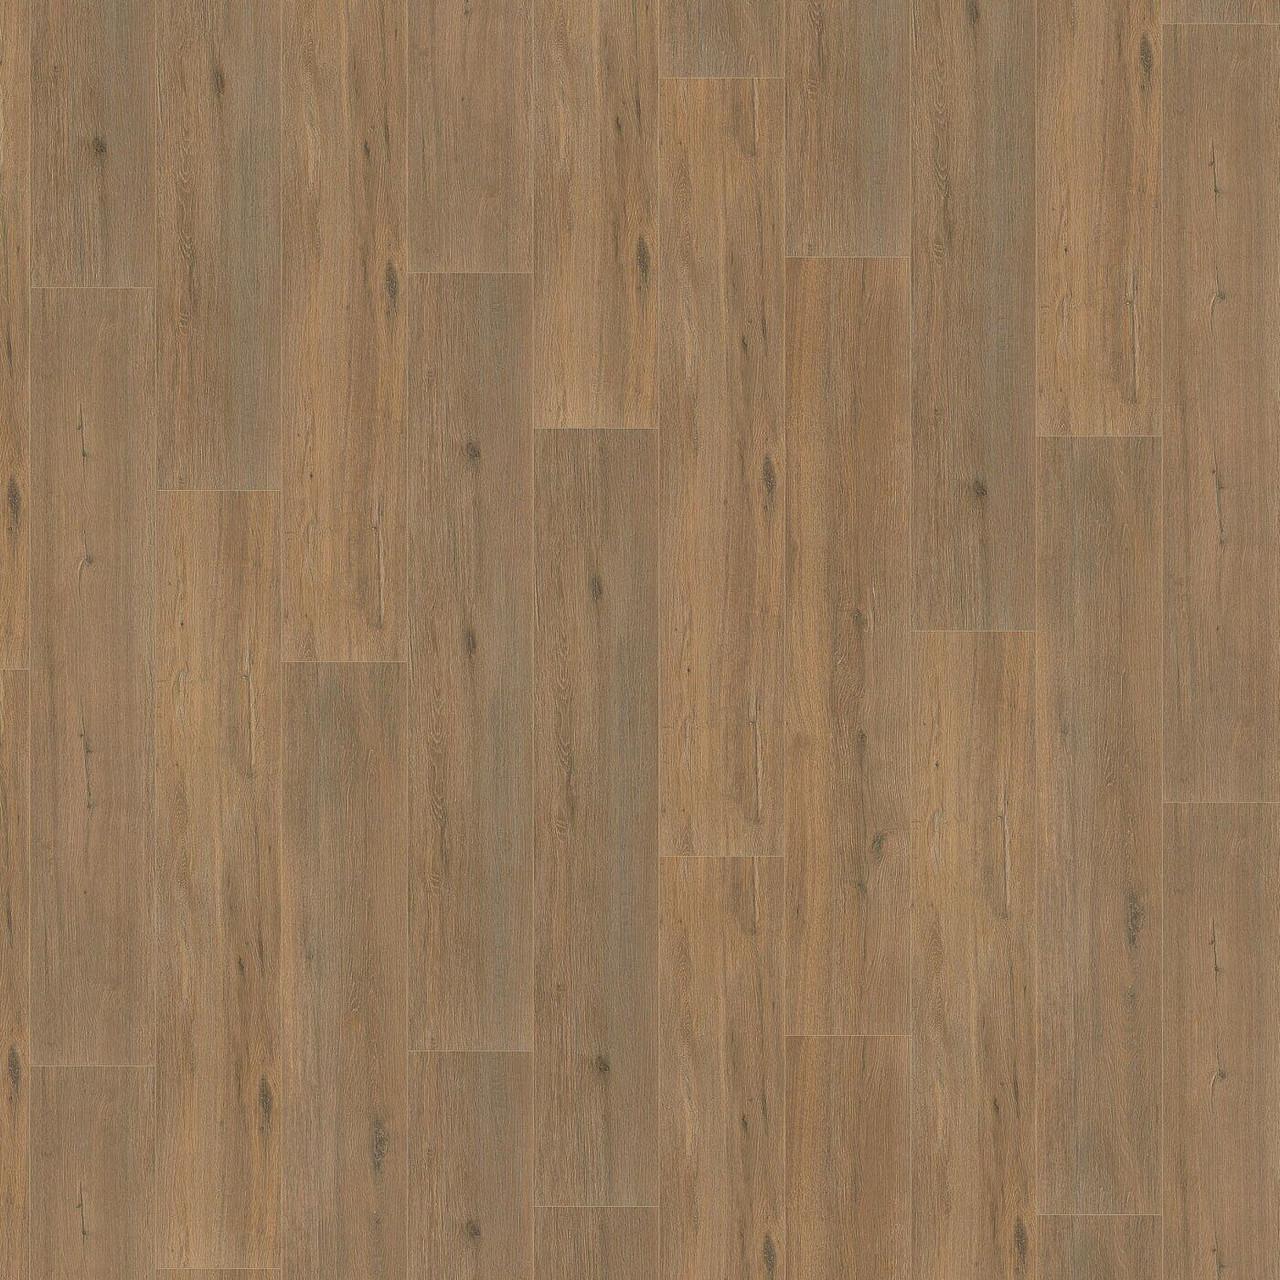 Ламинат WINEO Дуб дикий коричневий